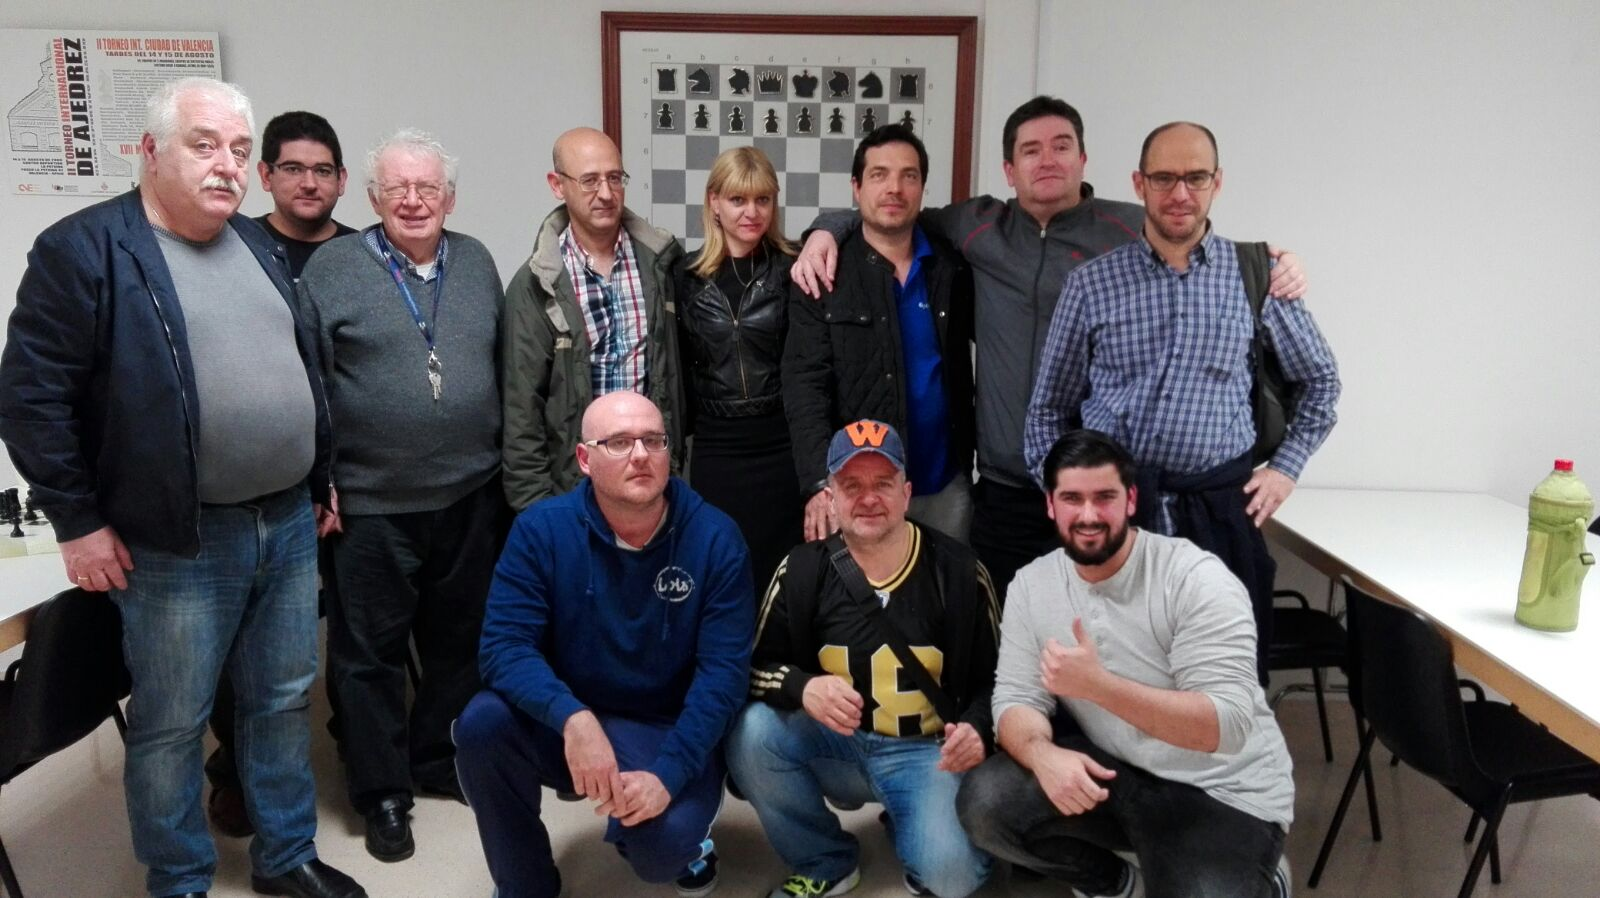 El  club de  ajedrez de l'Alfàs del Pi  sigue imparable y continúa el primero  de la liga autonómica.